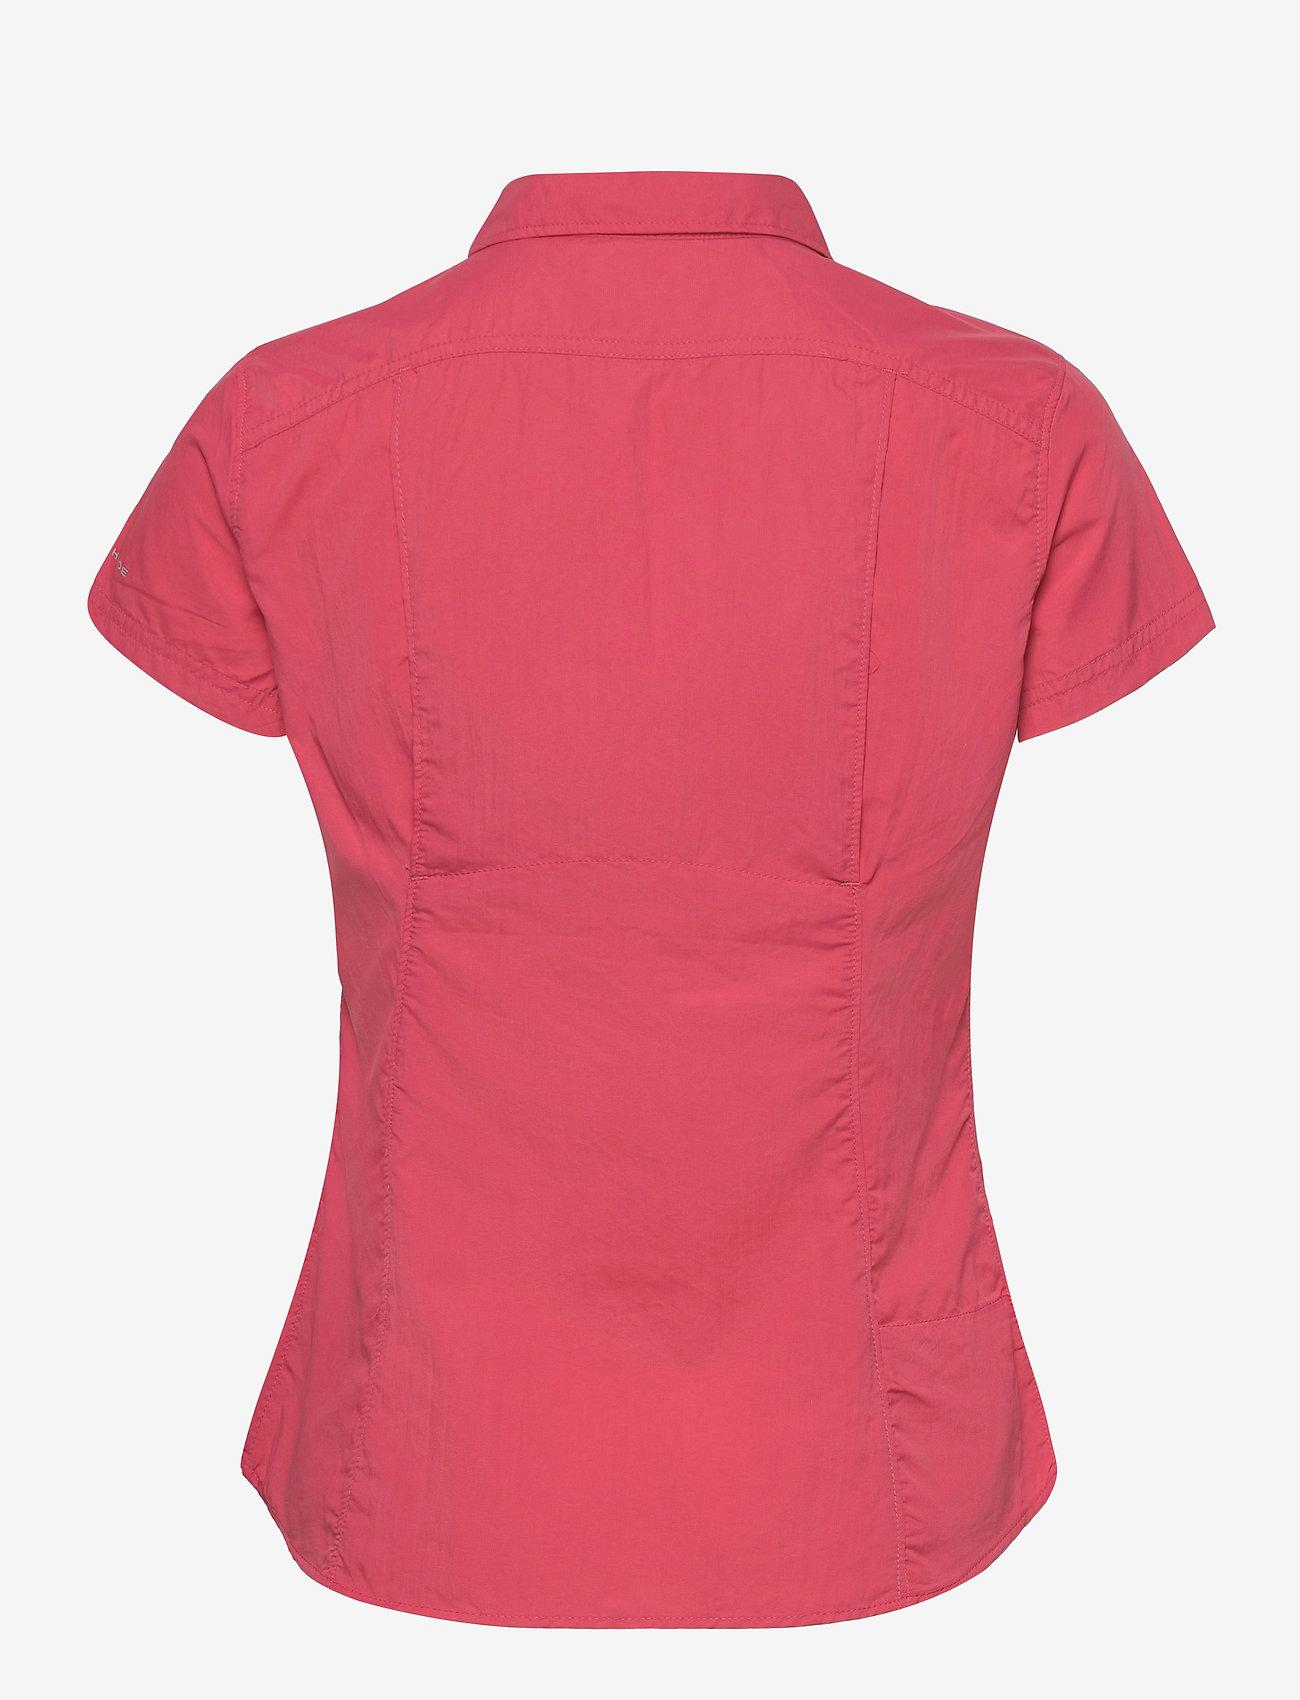 Columbia - Silver Ridge 2.0 Short Sleeve - koszule z krótkim rękawem - rouge pink - 1